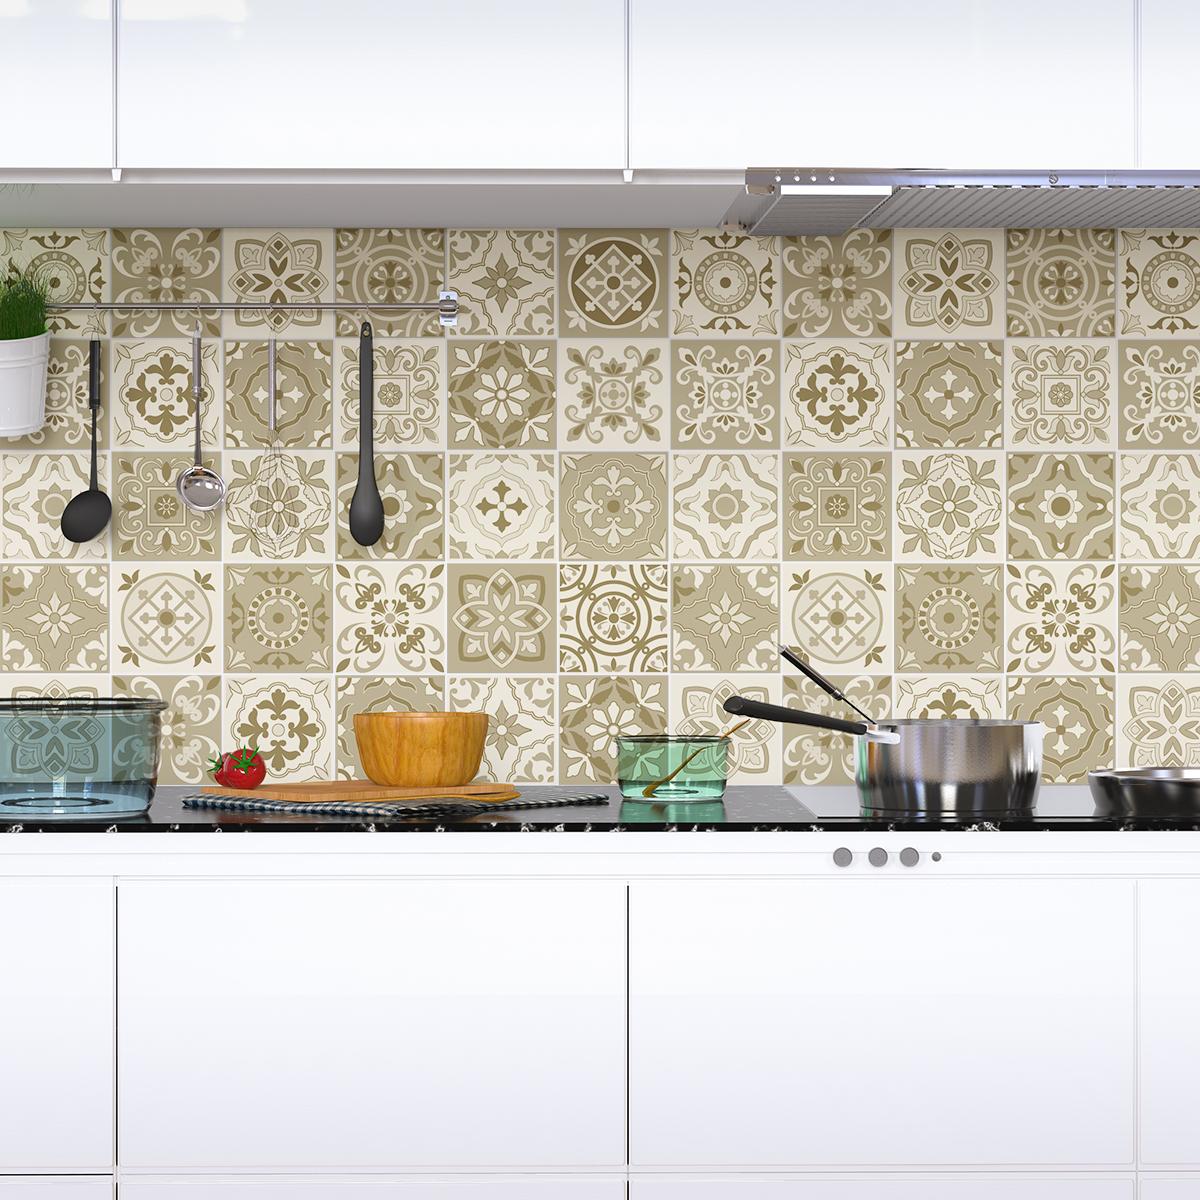 60 stickers carreaux de ciment azulejos fortunato. Black Bedroom Furniture Sets. Home Design Ideas